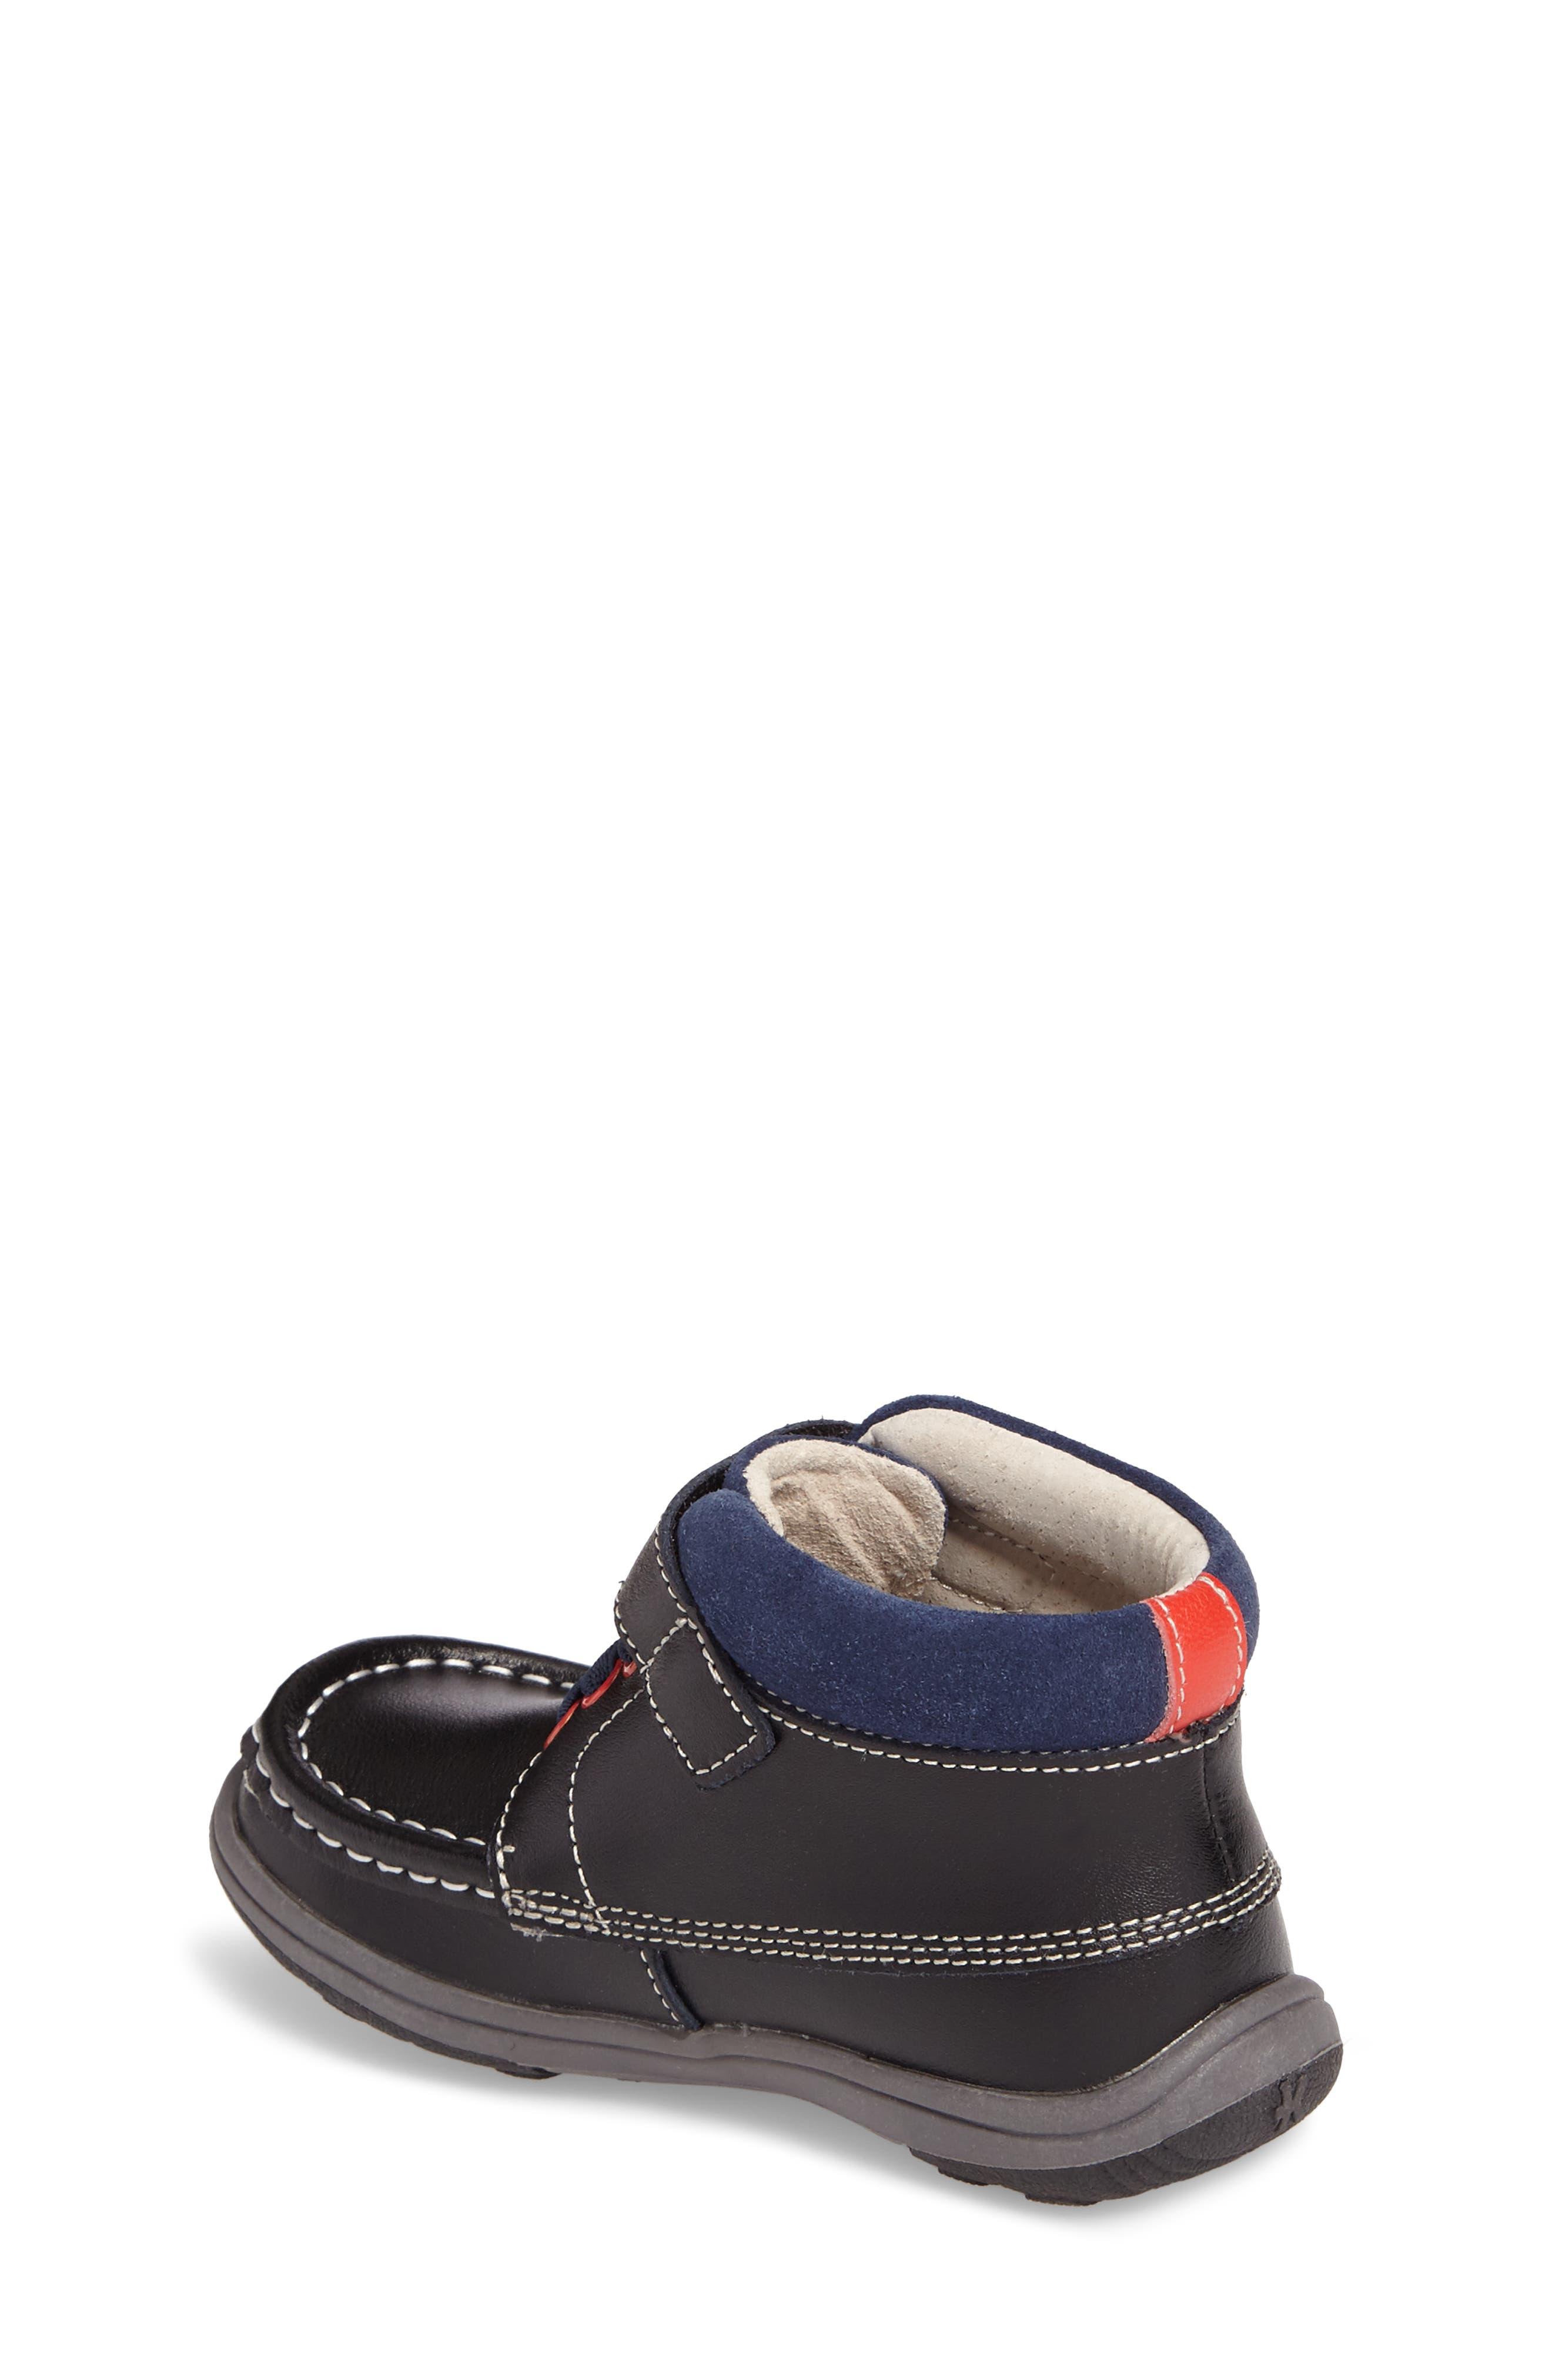 Alternate Image 2  - See Kai Run Owen High Top Sneaker Bootie (Baby, Walker & Toddler)